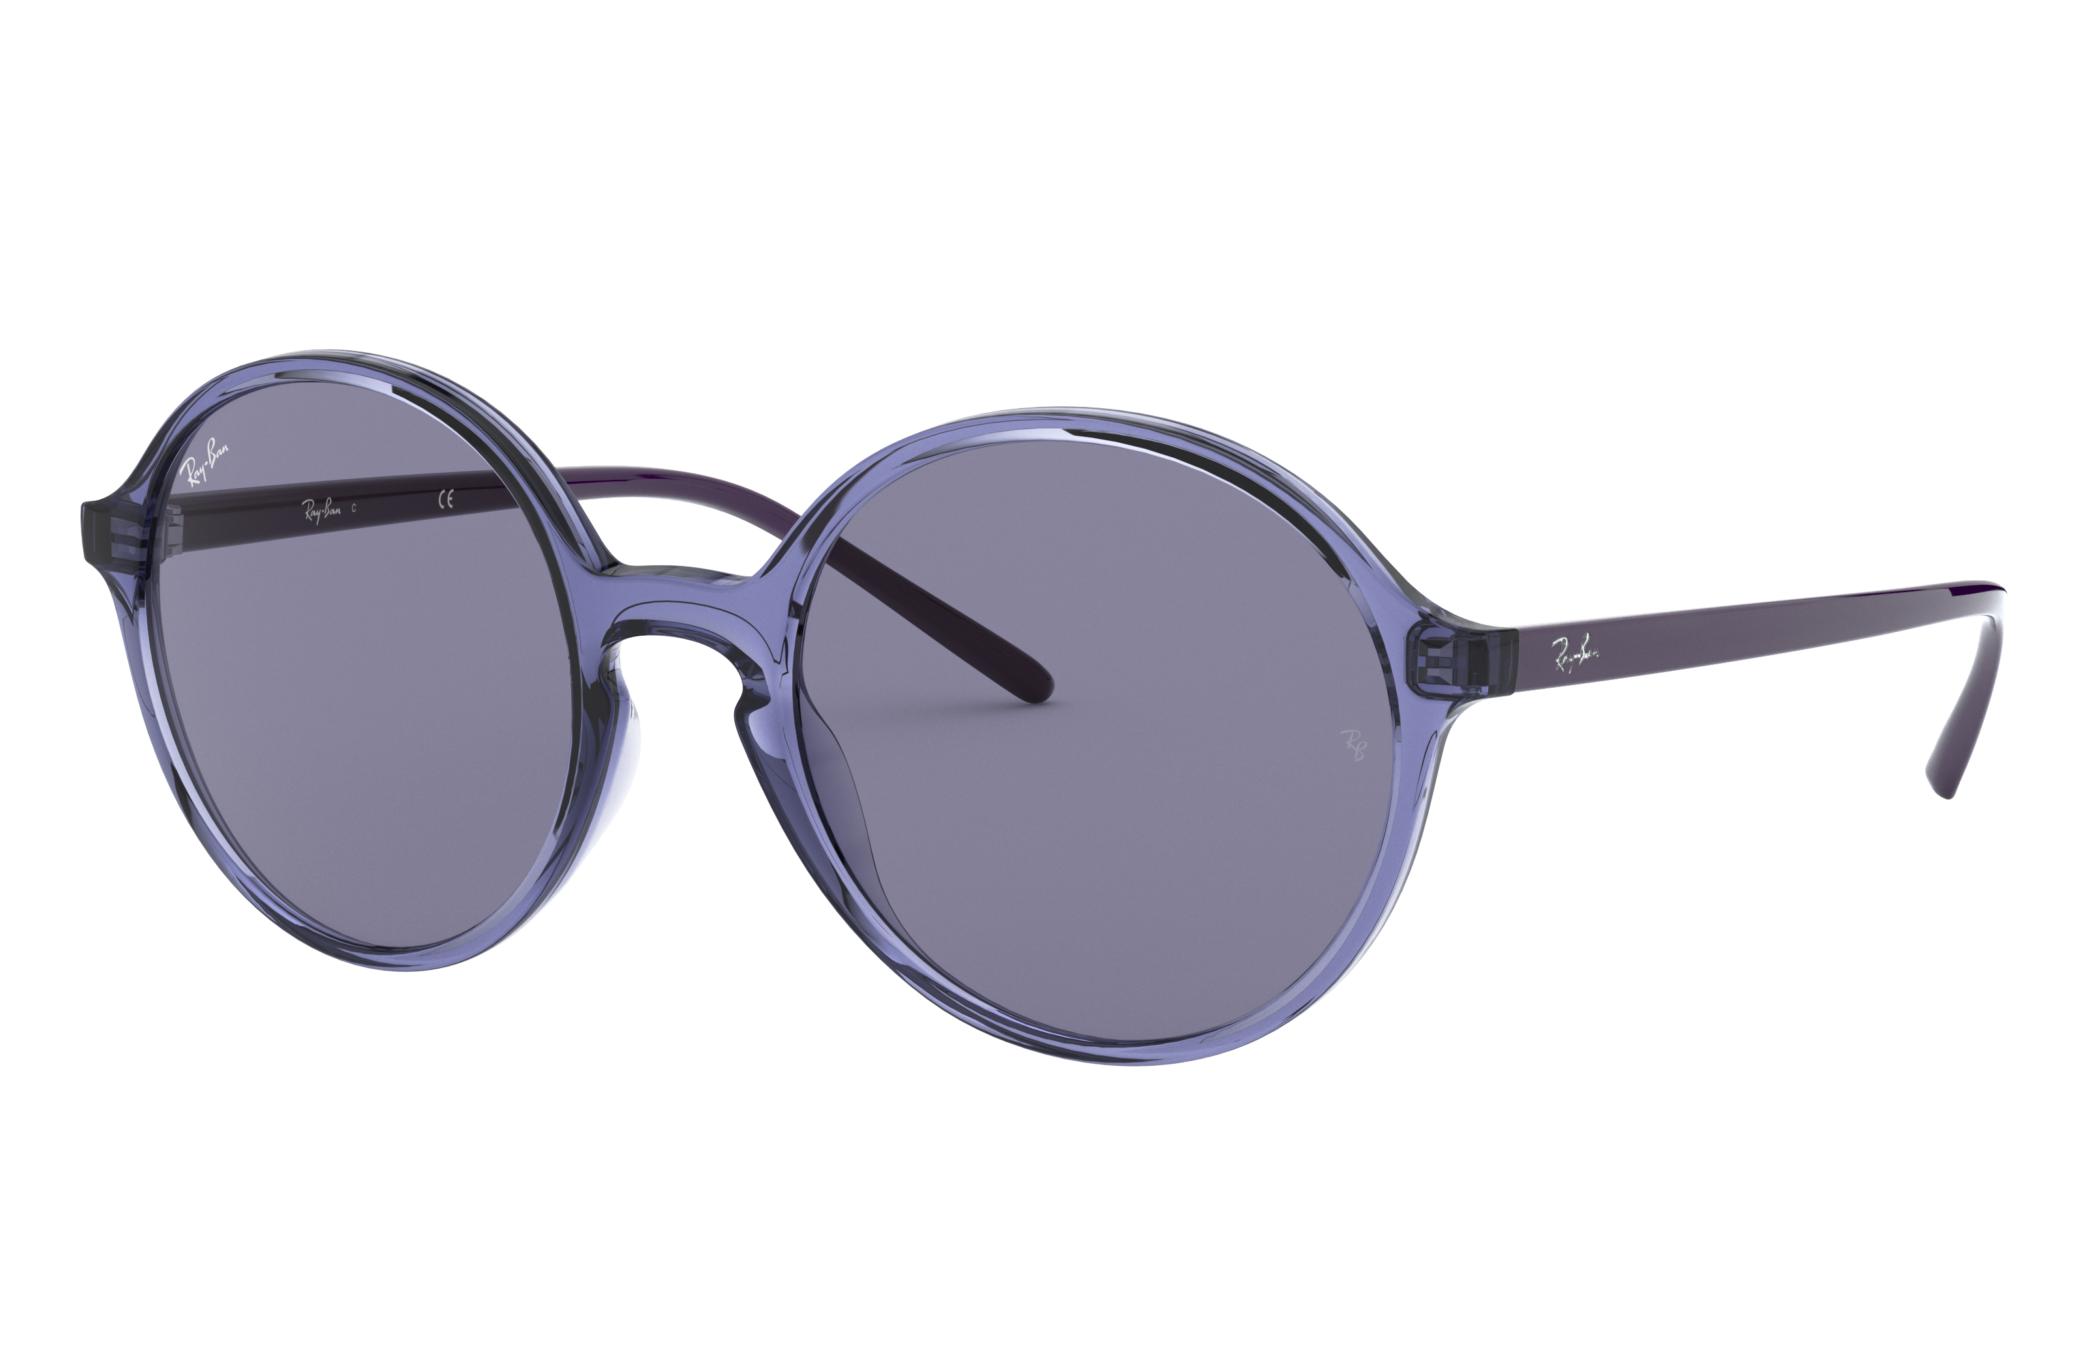 Ray-Ban Rb4304 Low Bridge Fit Violet, Blue Lenses - RB4304F